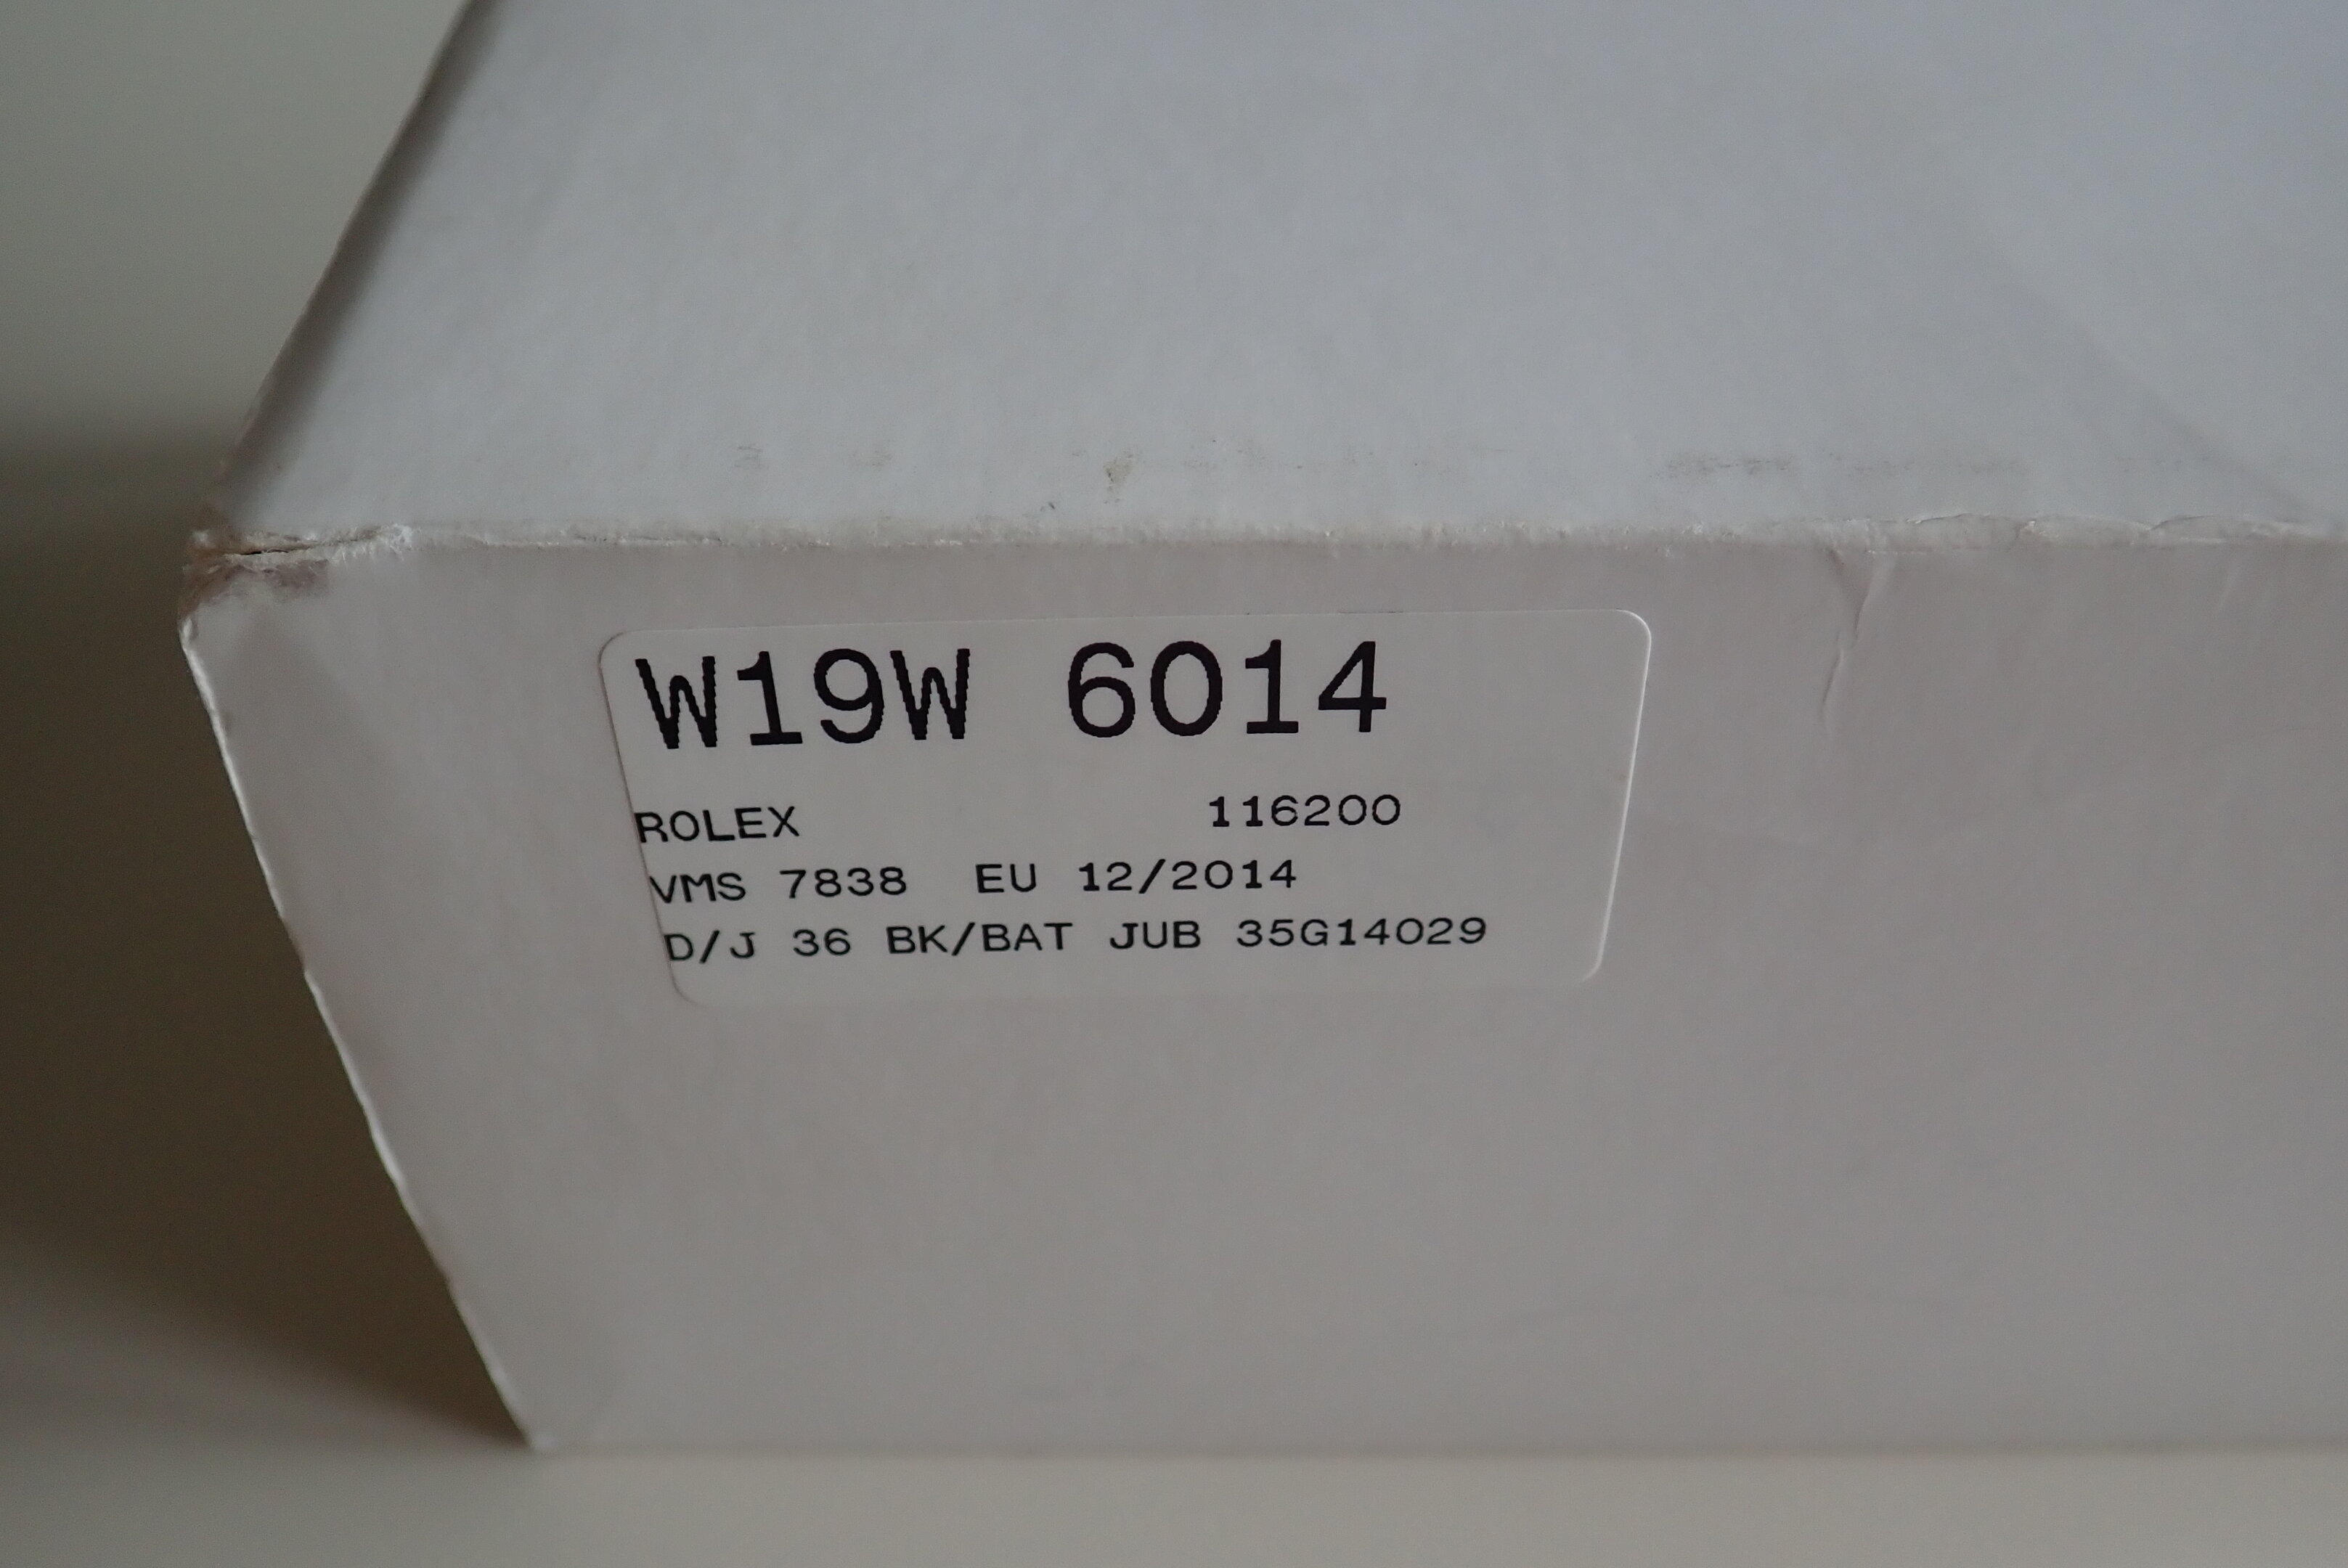 D8A8069F-714B-4E76-942B-2F60E33ADC0D.